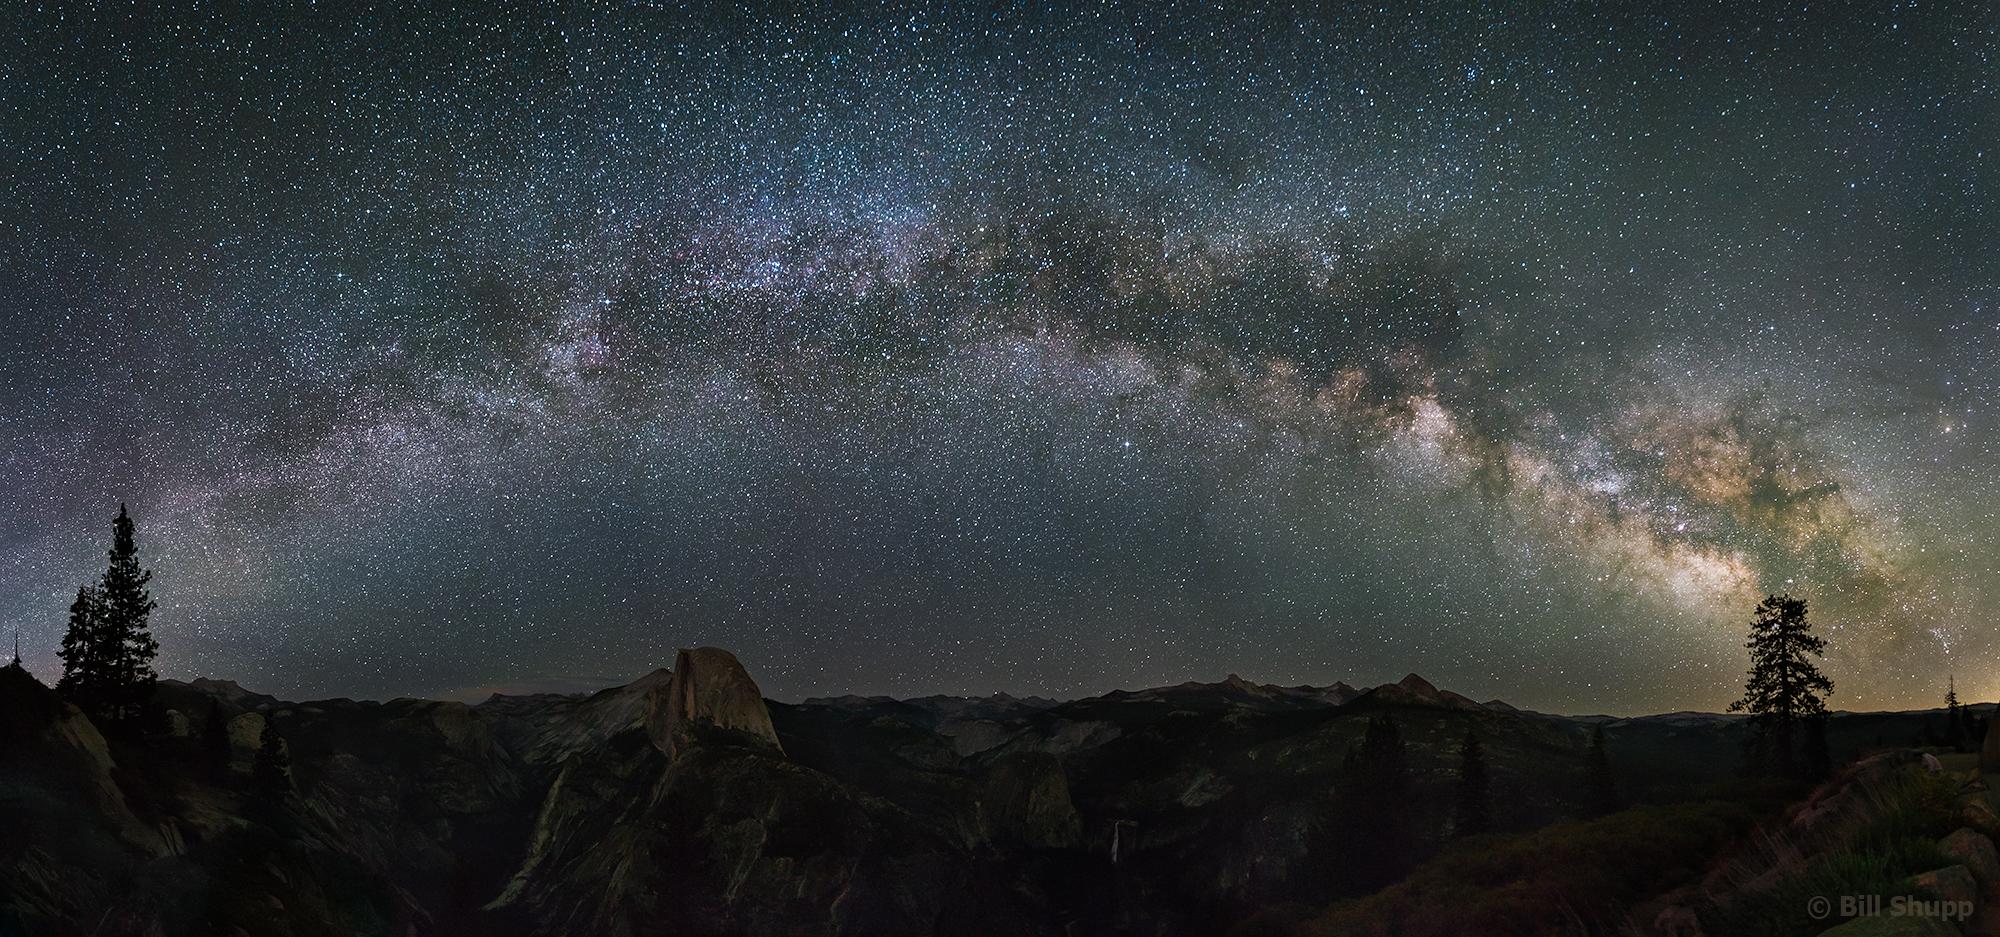 Milky Way Rising Over Half Dome, Yosemite